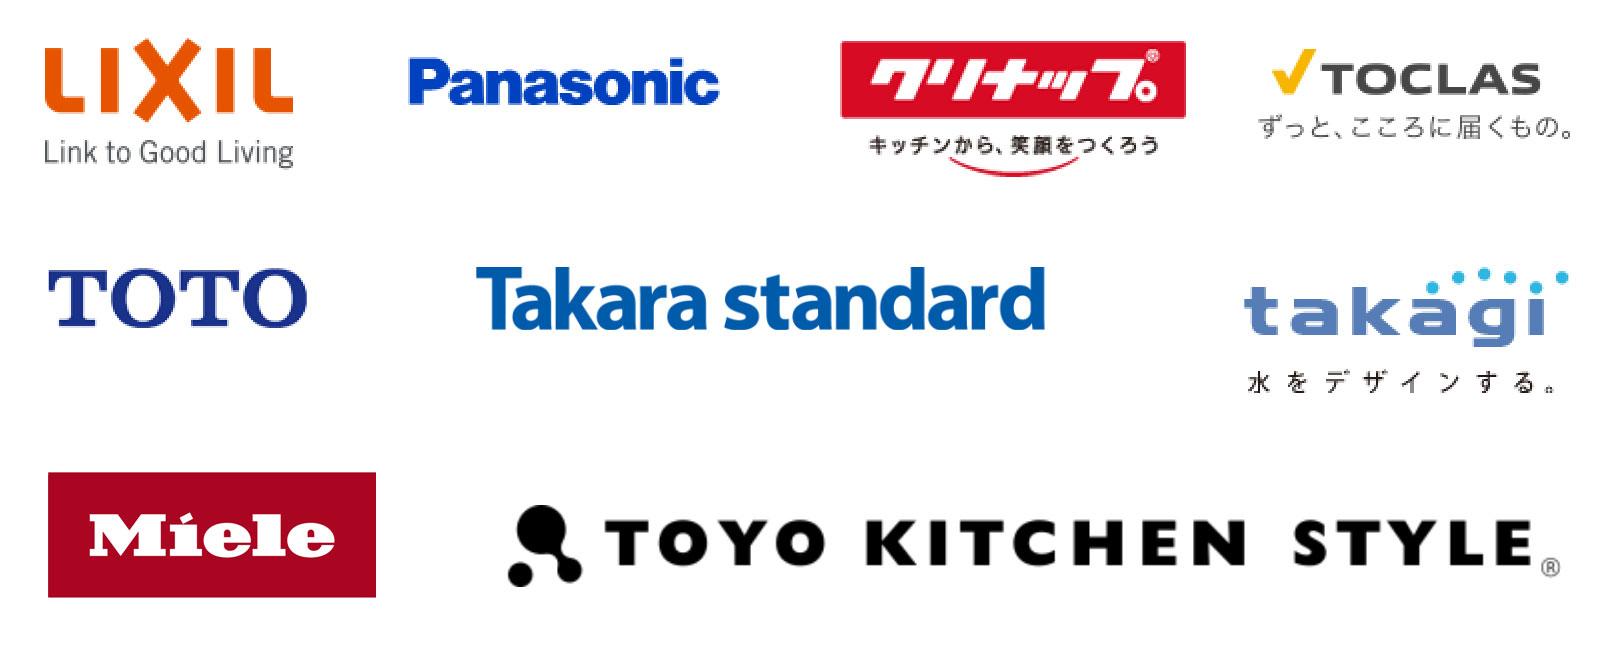 LIXIL, Panasonic, クリナップ, TOCLAS, TOTO, TAKARA Standard, Takagi, Miele, TOYO KITCHEN STYLE